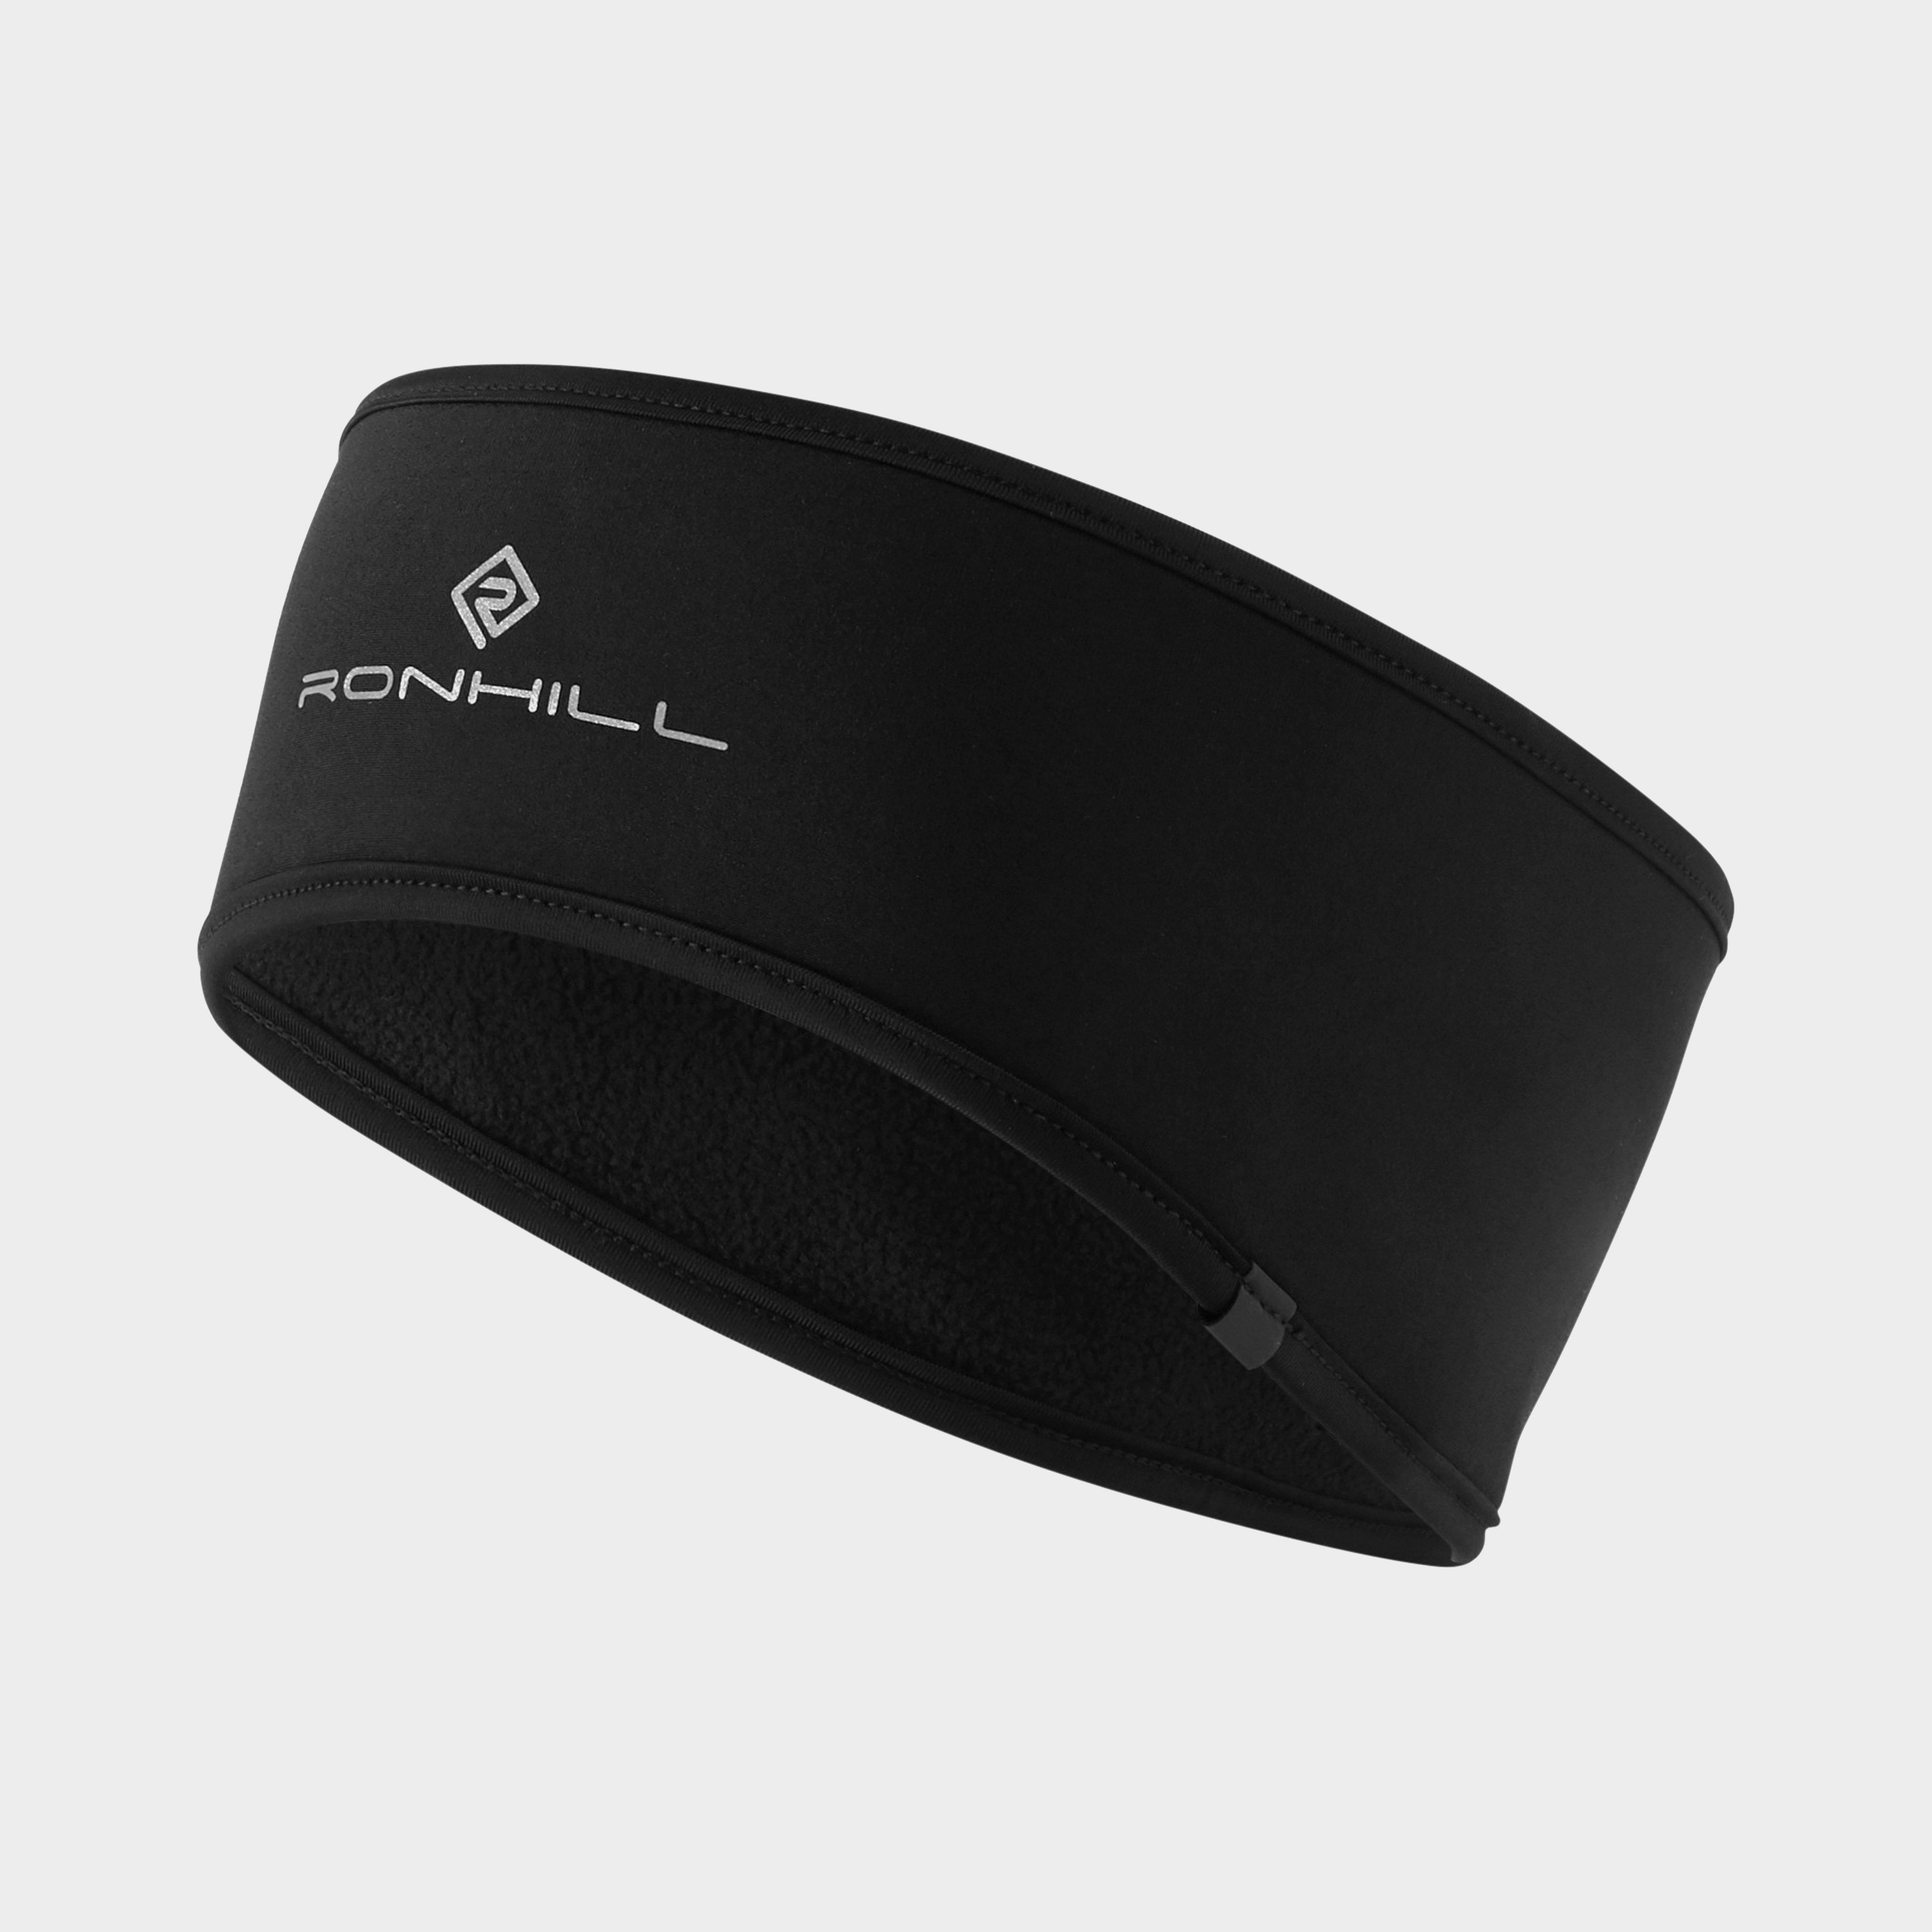 RONHILL Wind Block Windproof Running Gym Thermal Headband Black//Pink *NEW*